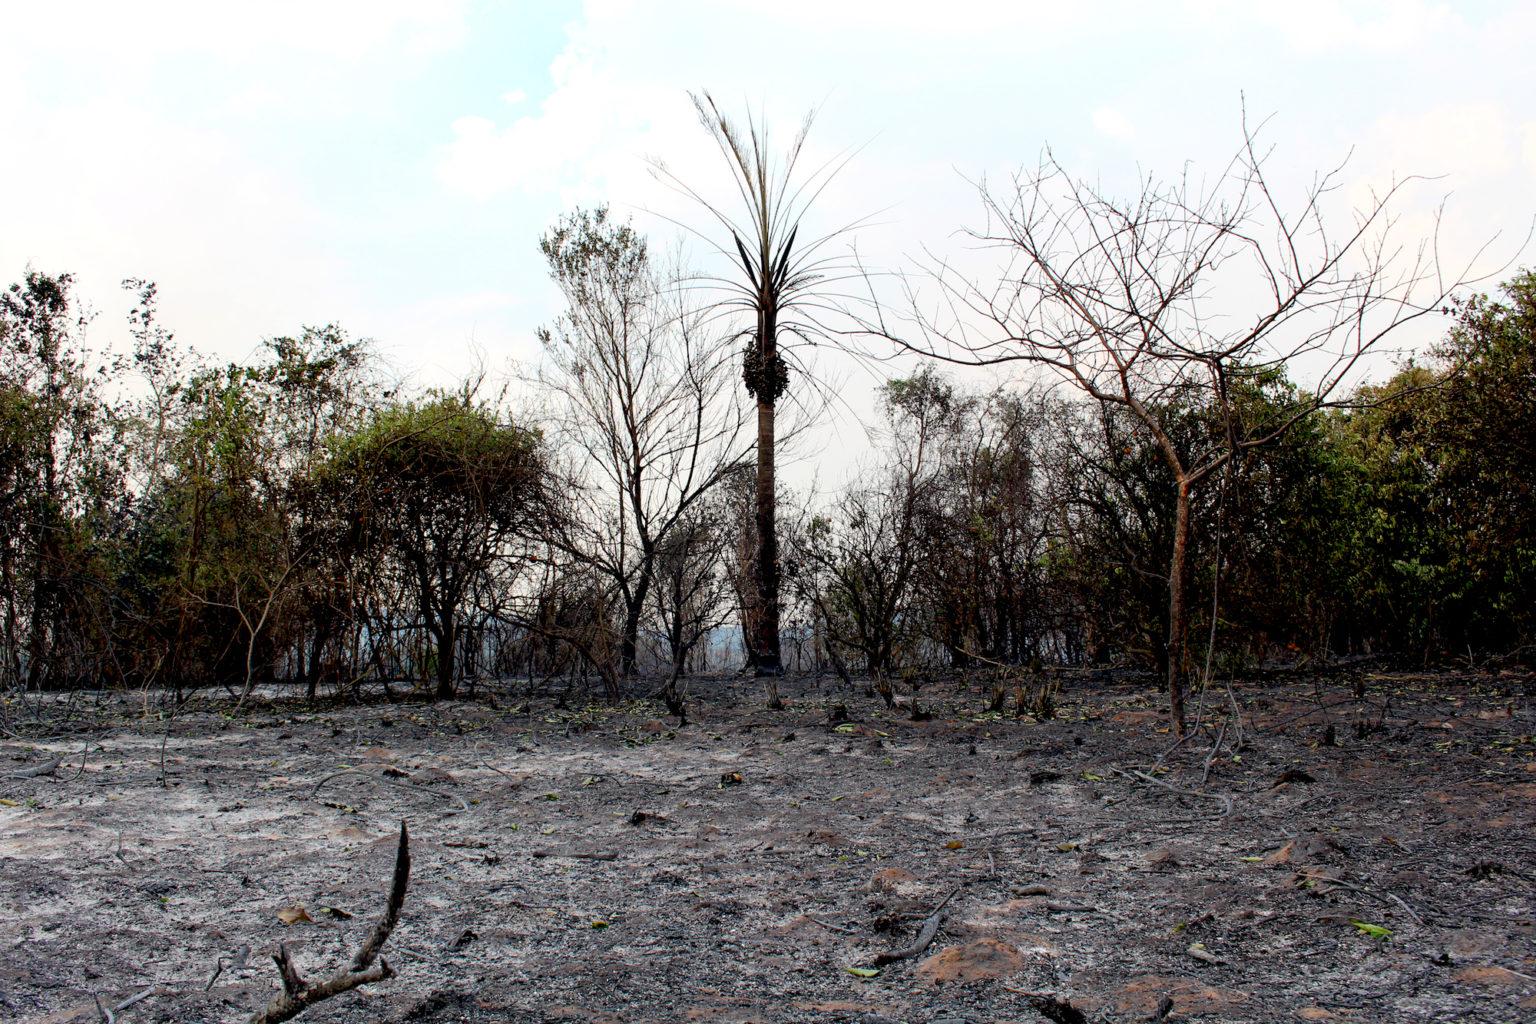 Fire-devastated landscape in San Rafael. Image by Hugo Garay/WWF.